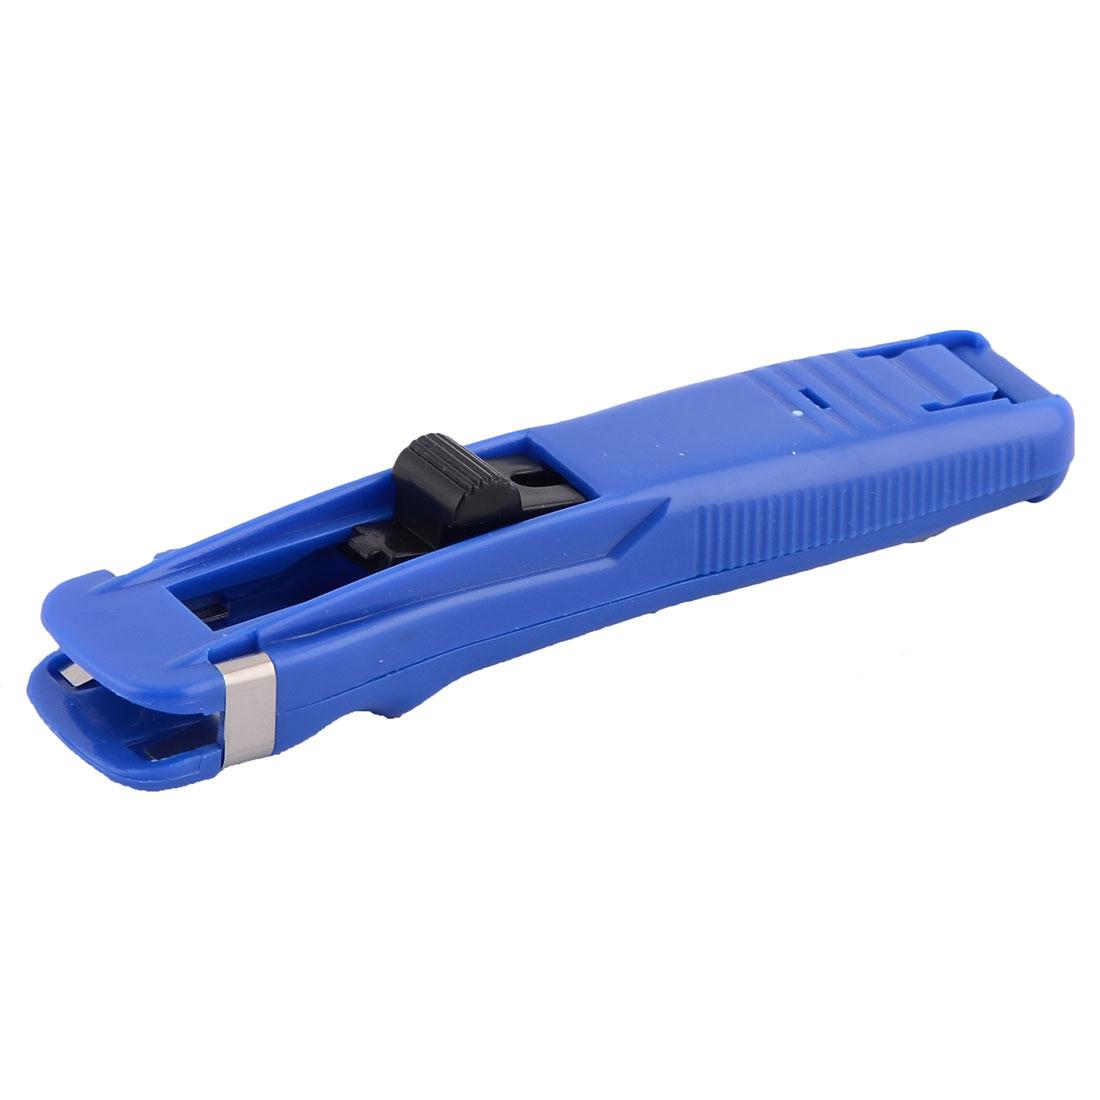 Office Plastic Paper Fast Clam Clip Stapler Dispenser Blue